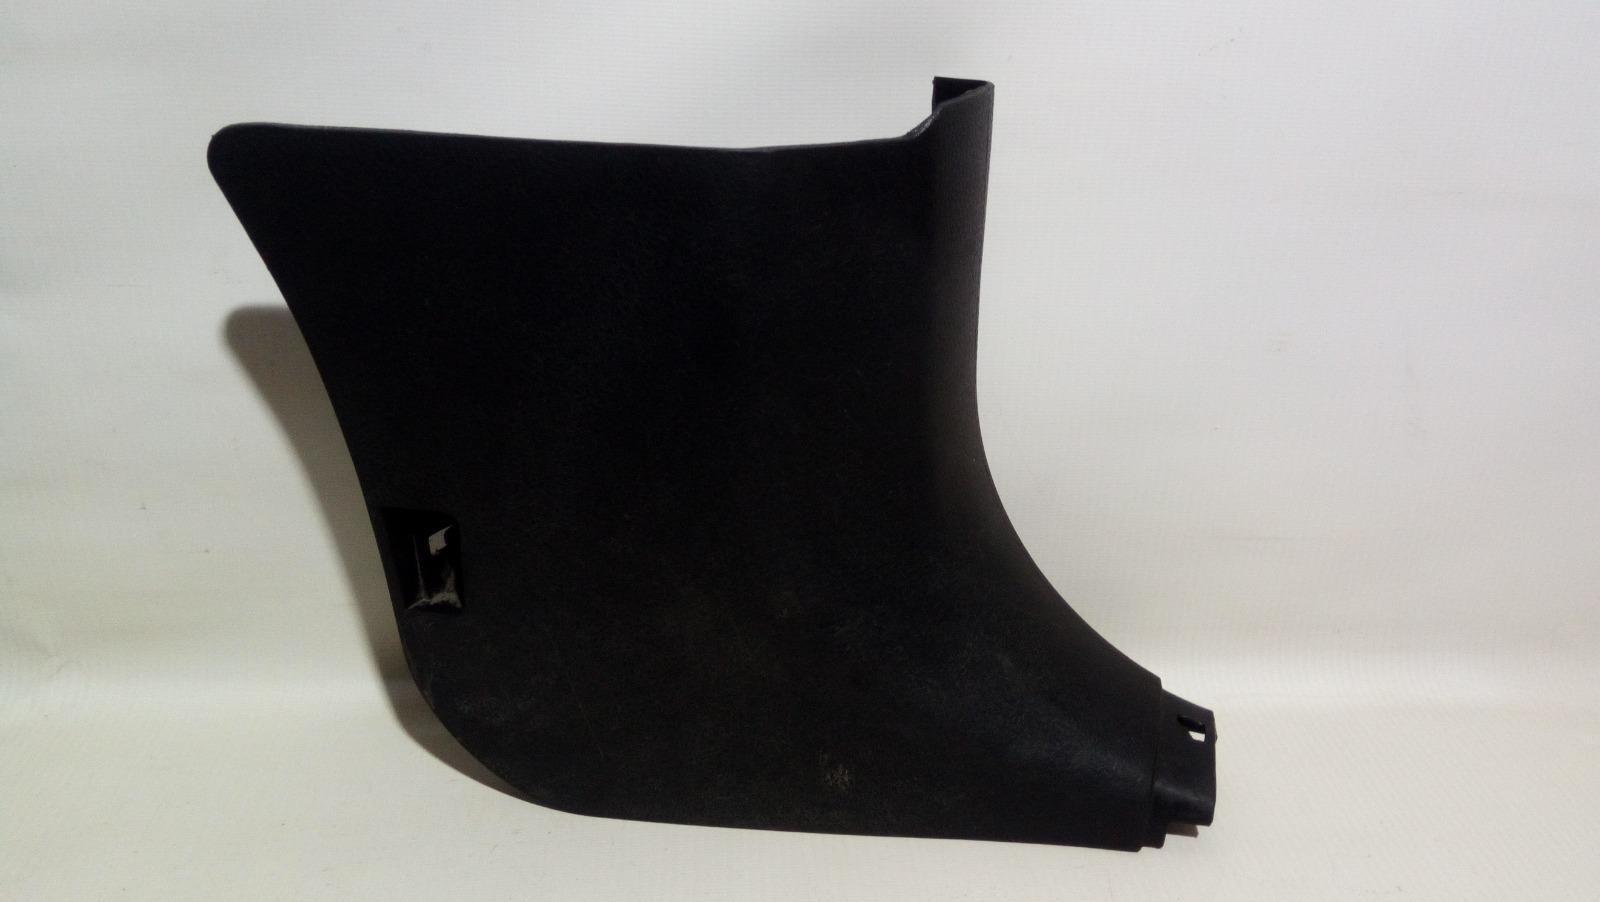 Обшивка, панель салона Geely Mk Cross 5A-FE 2013 передний правый нижний